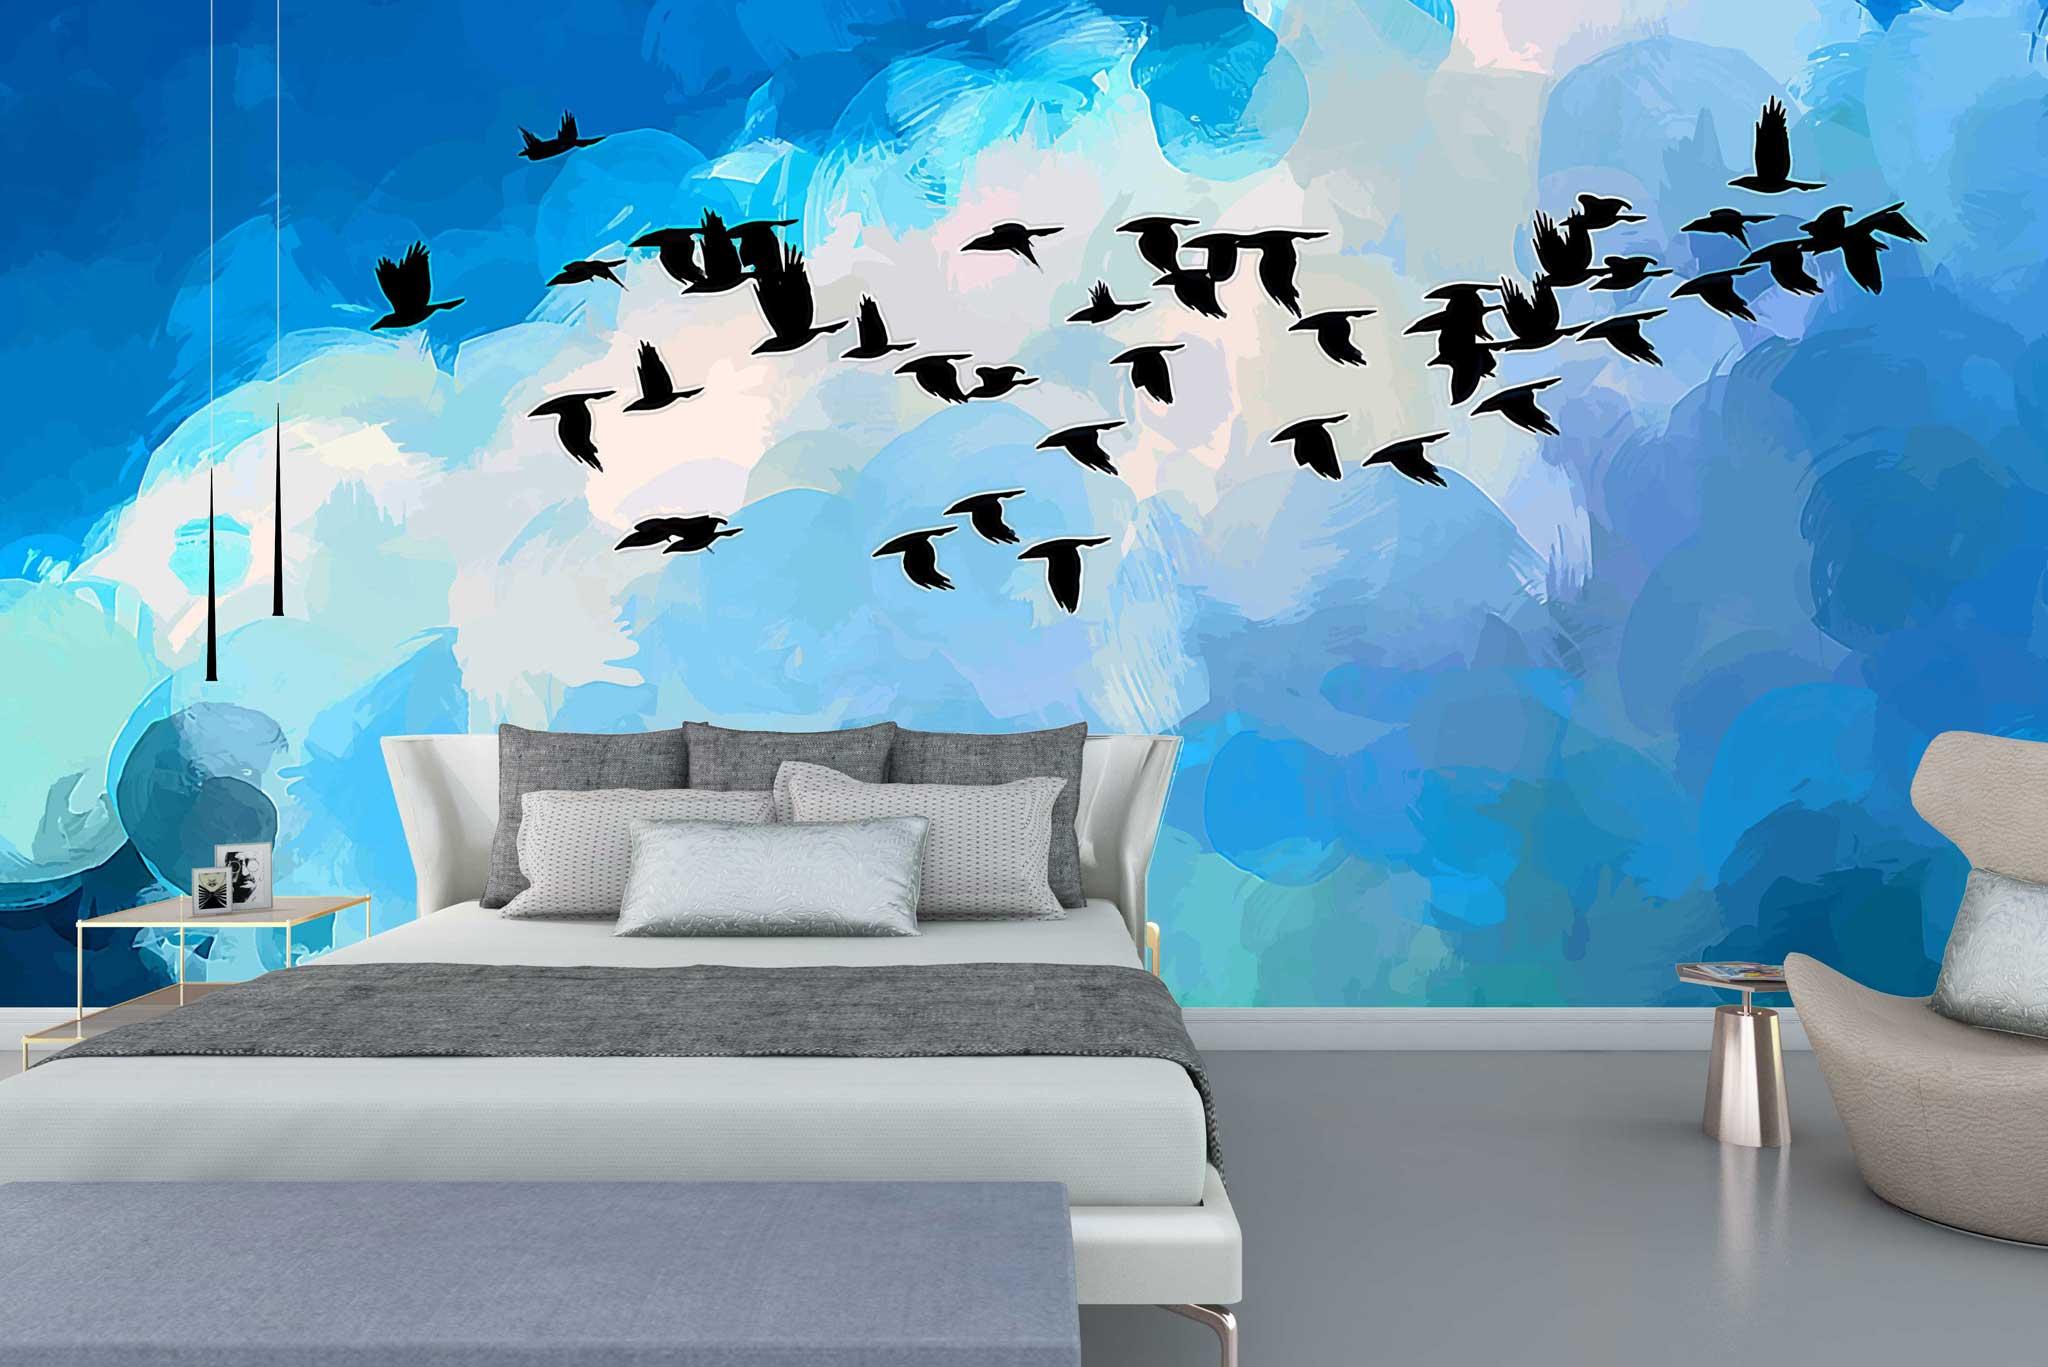 tapet-fototapet-comanda-personalizat-bucuresti-perete-special-lux-model-pictura-desen-pasari-zbor-cer